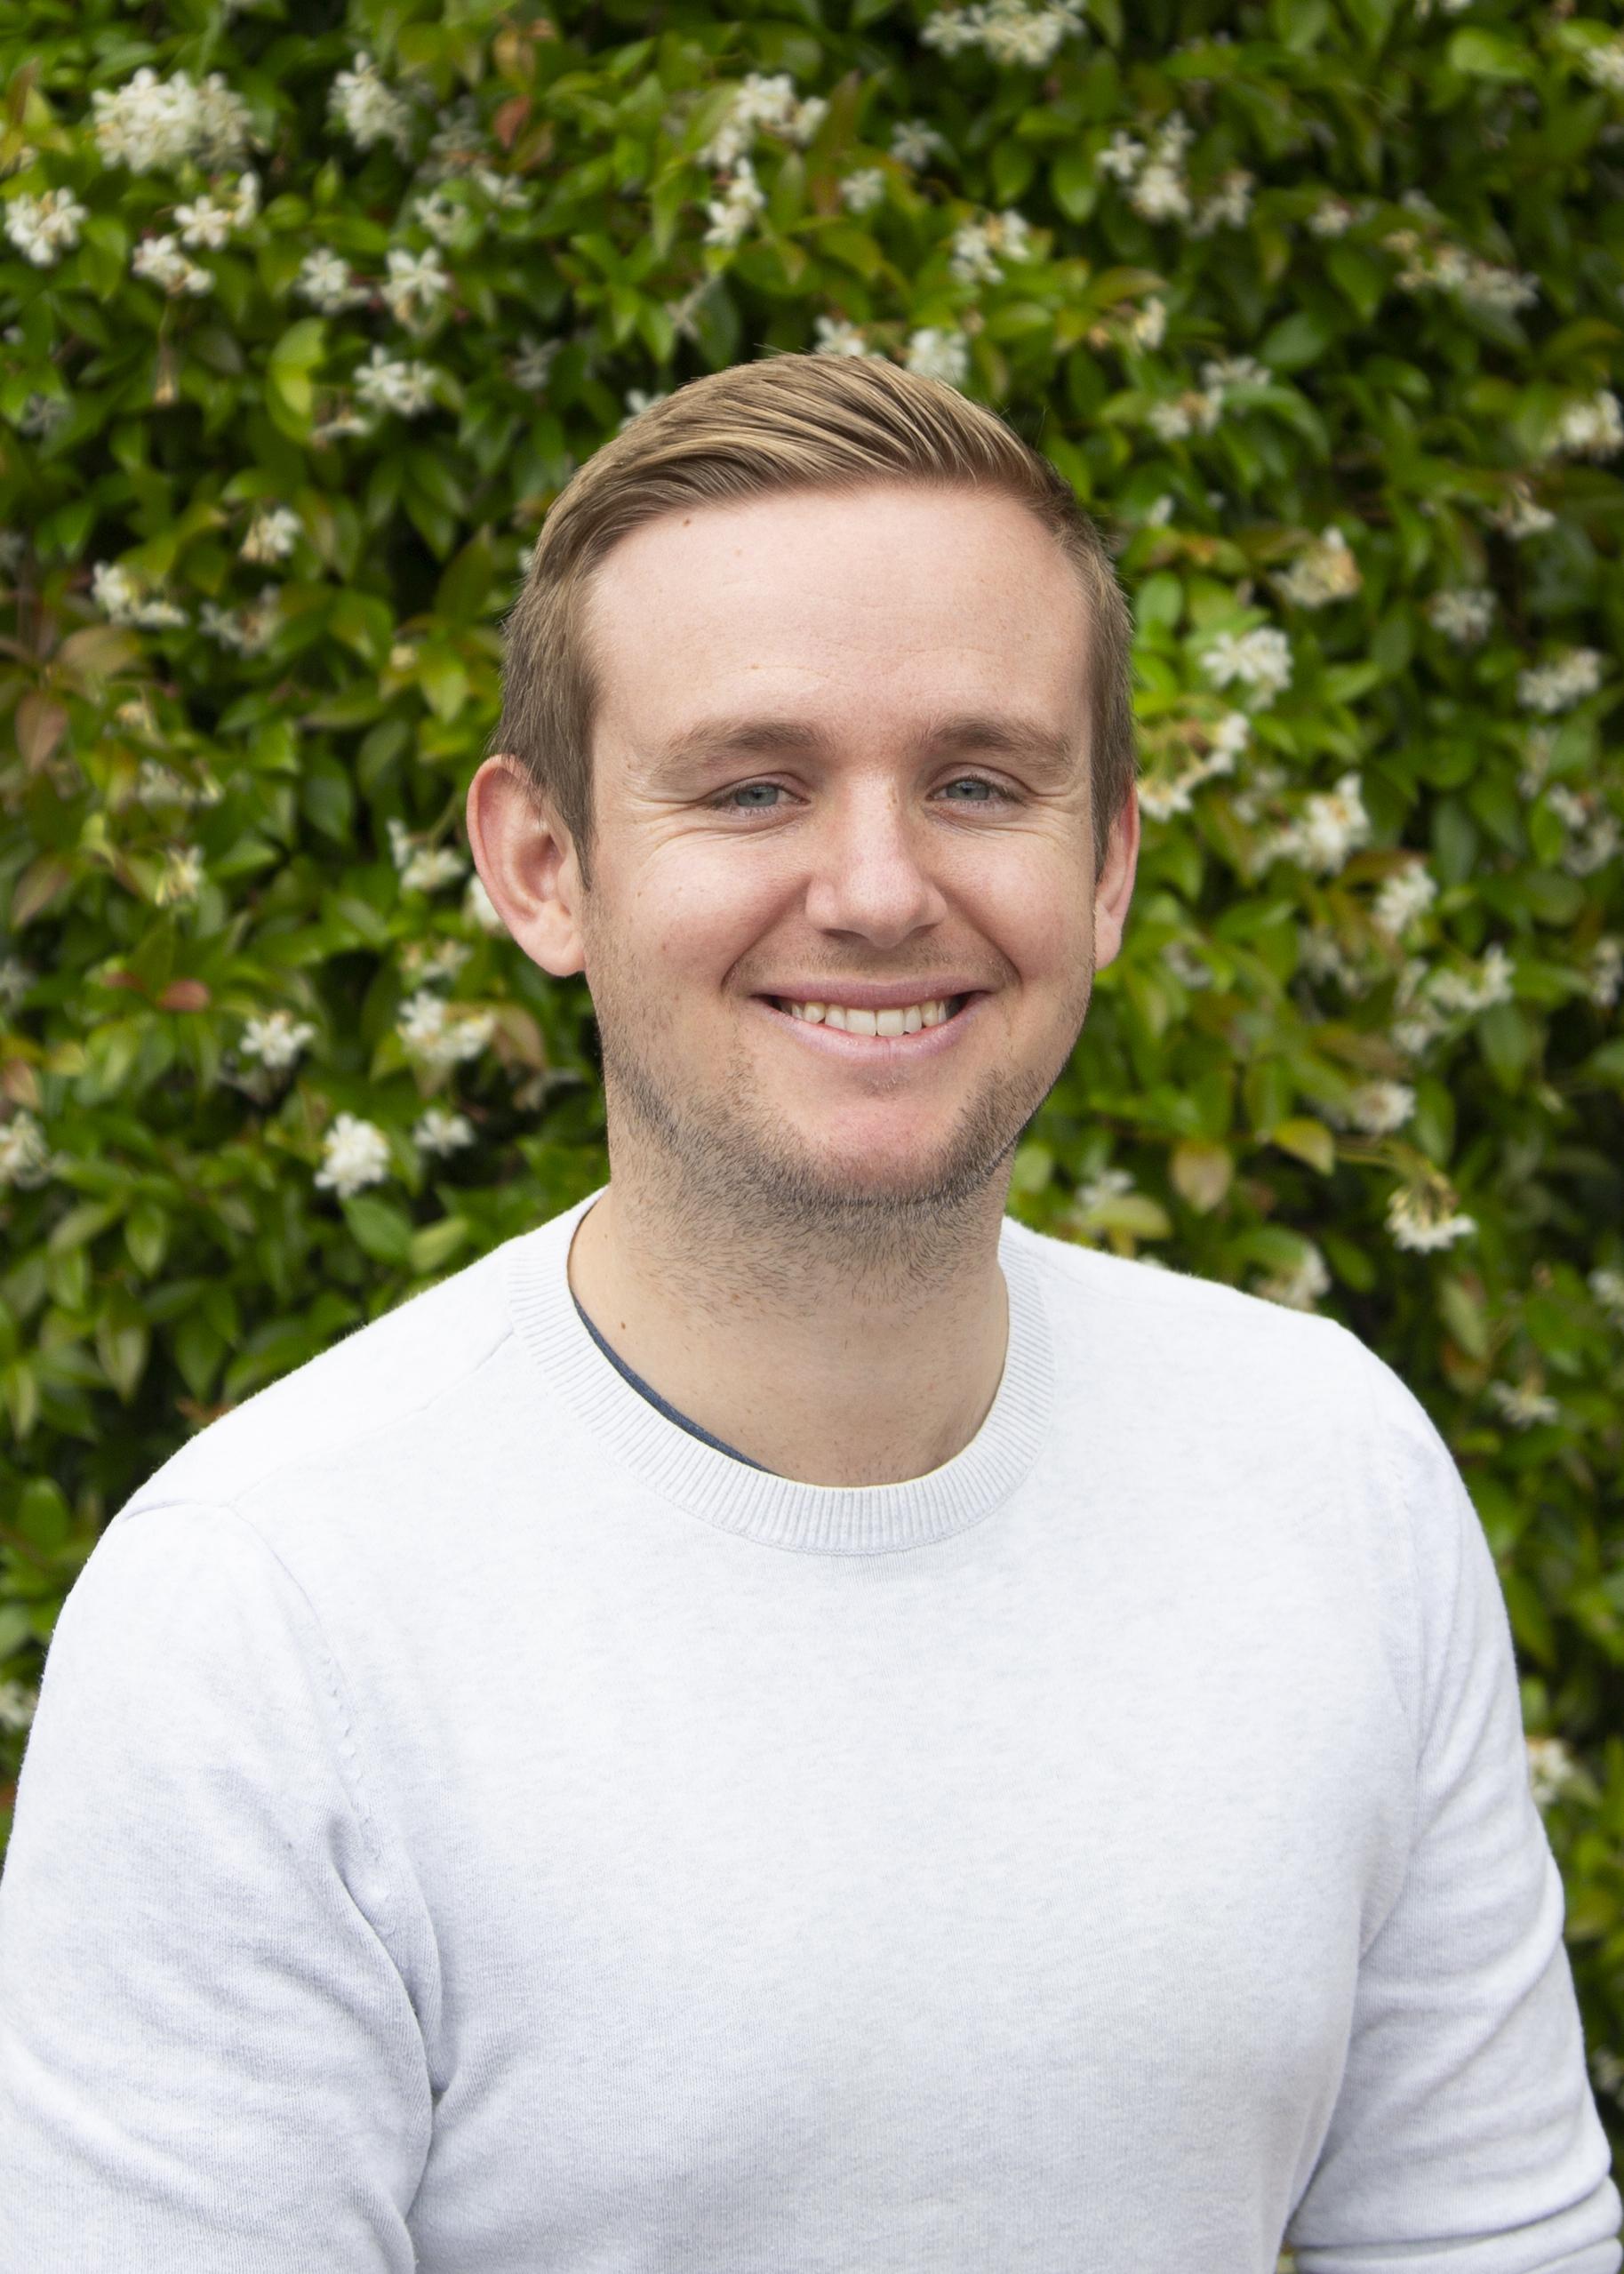 Josh Keane